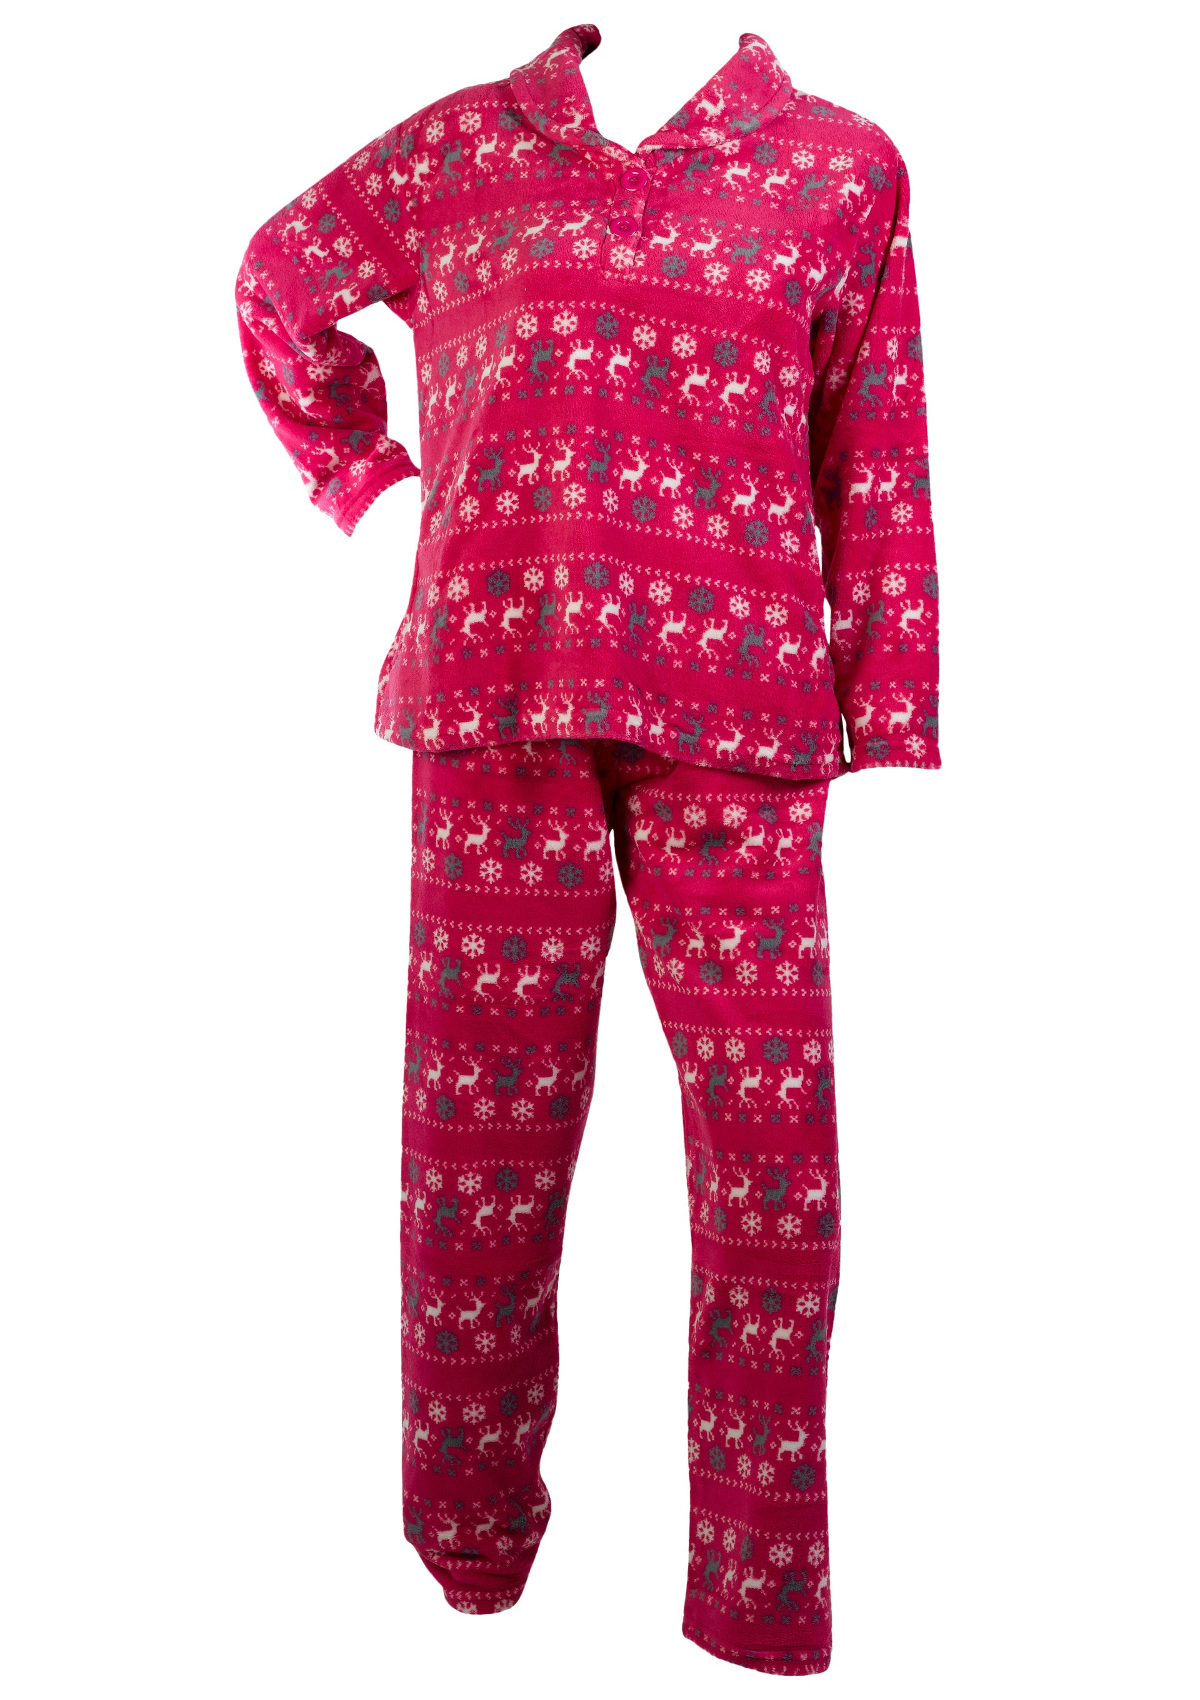 Pyjamas Womens Fairisle Reindeer Pattern PJs Soft Fleece Long Sleeve Top Bottoms